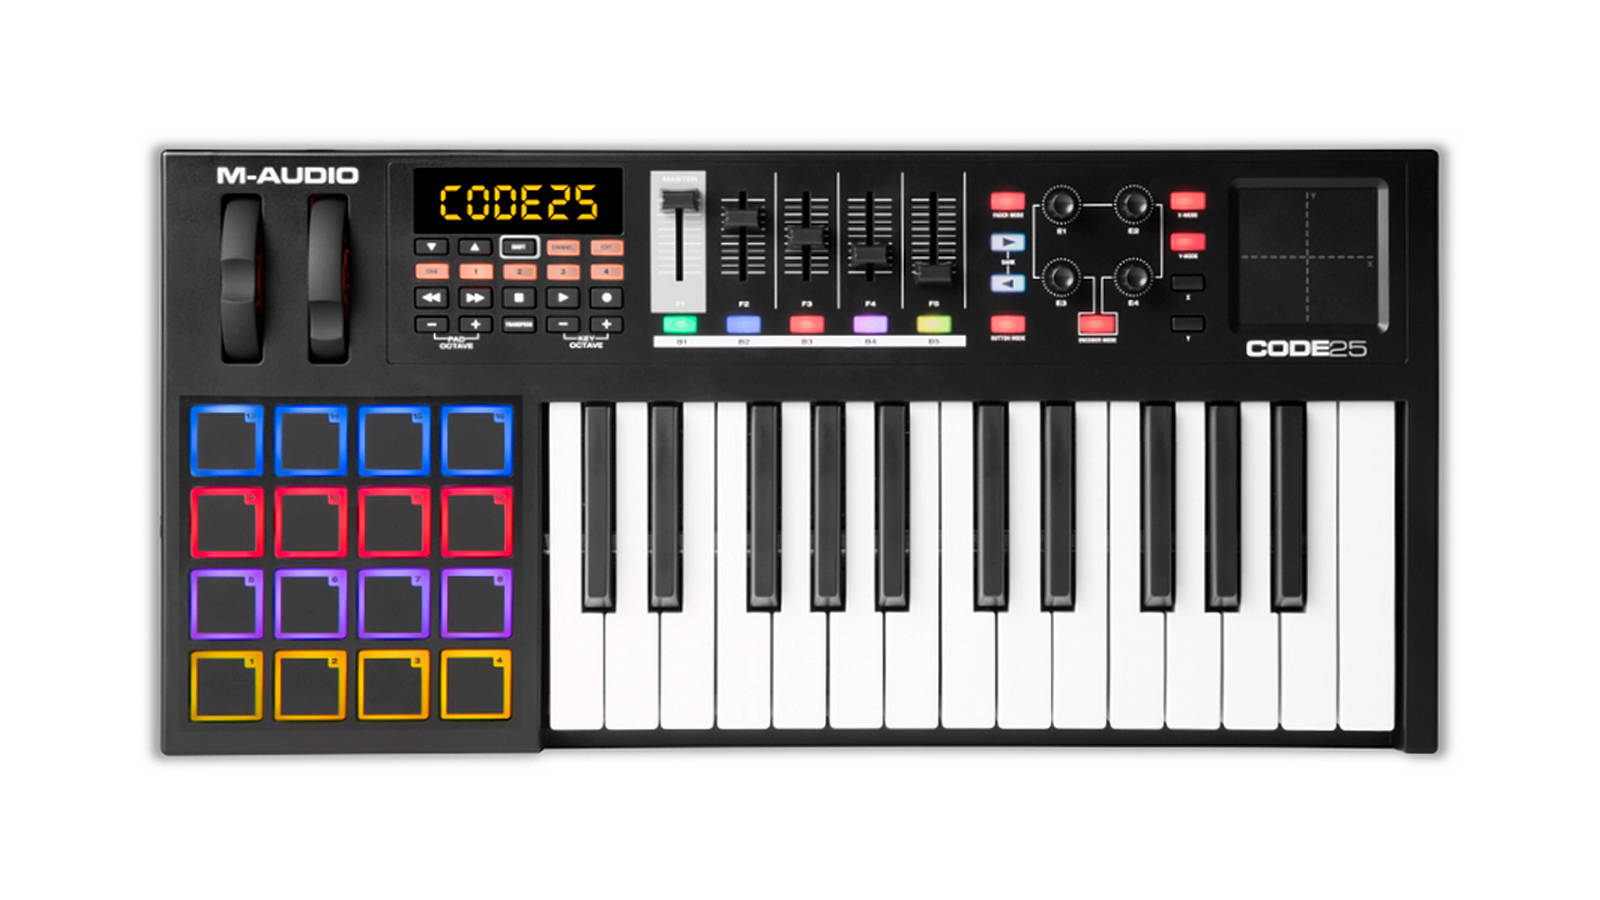 M-Audio Code 25 Black USB MIDI Controller mit X/Y Pad